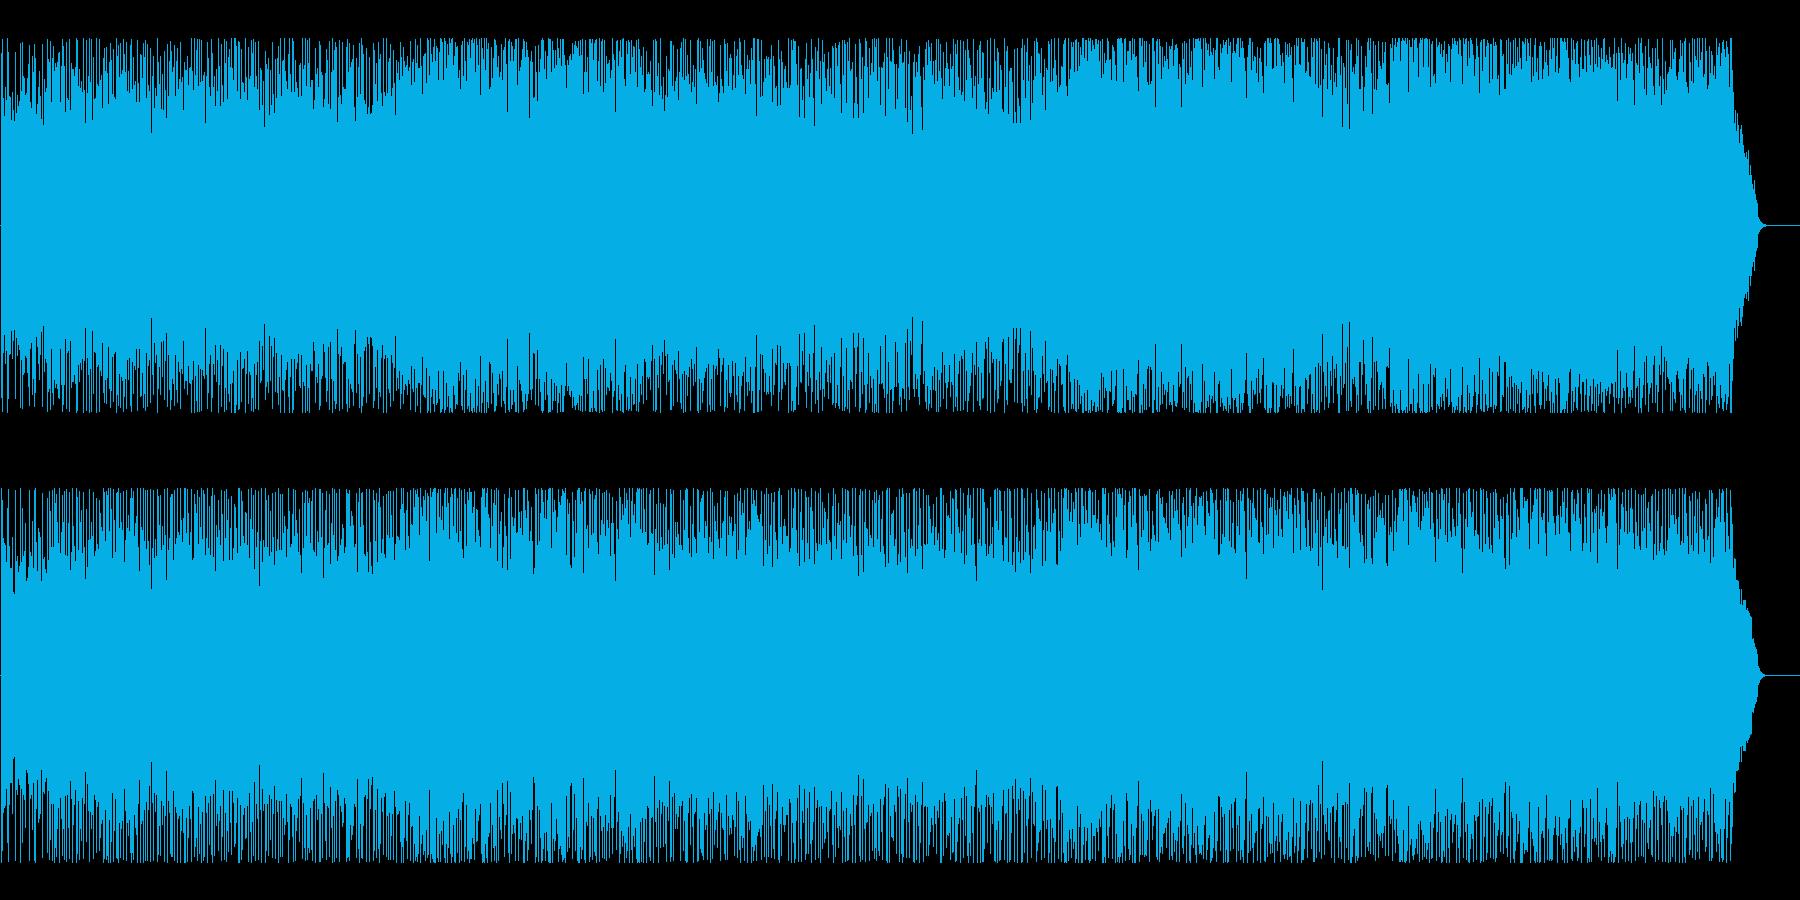 CM ショッピング 店内 情報 天気予報の再生済みの波形